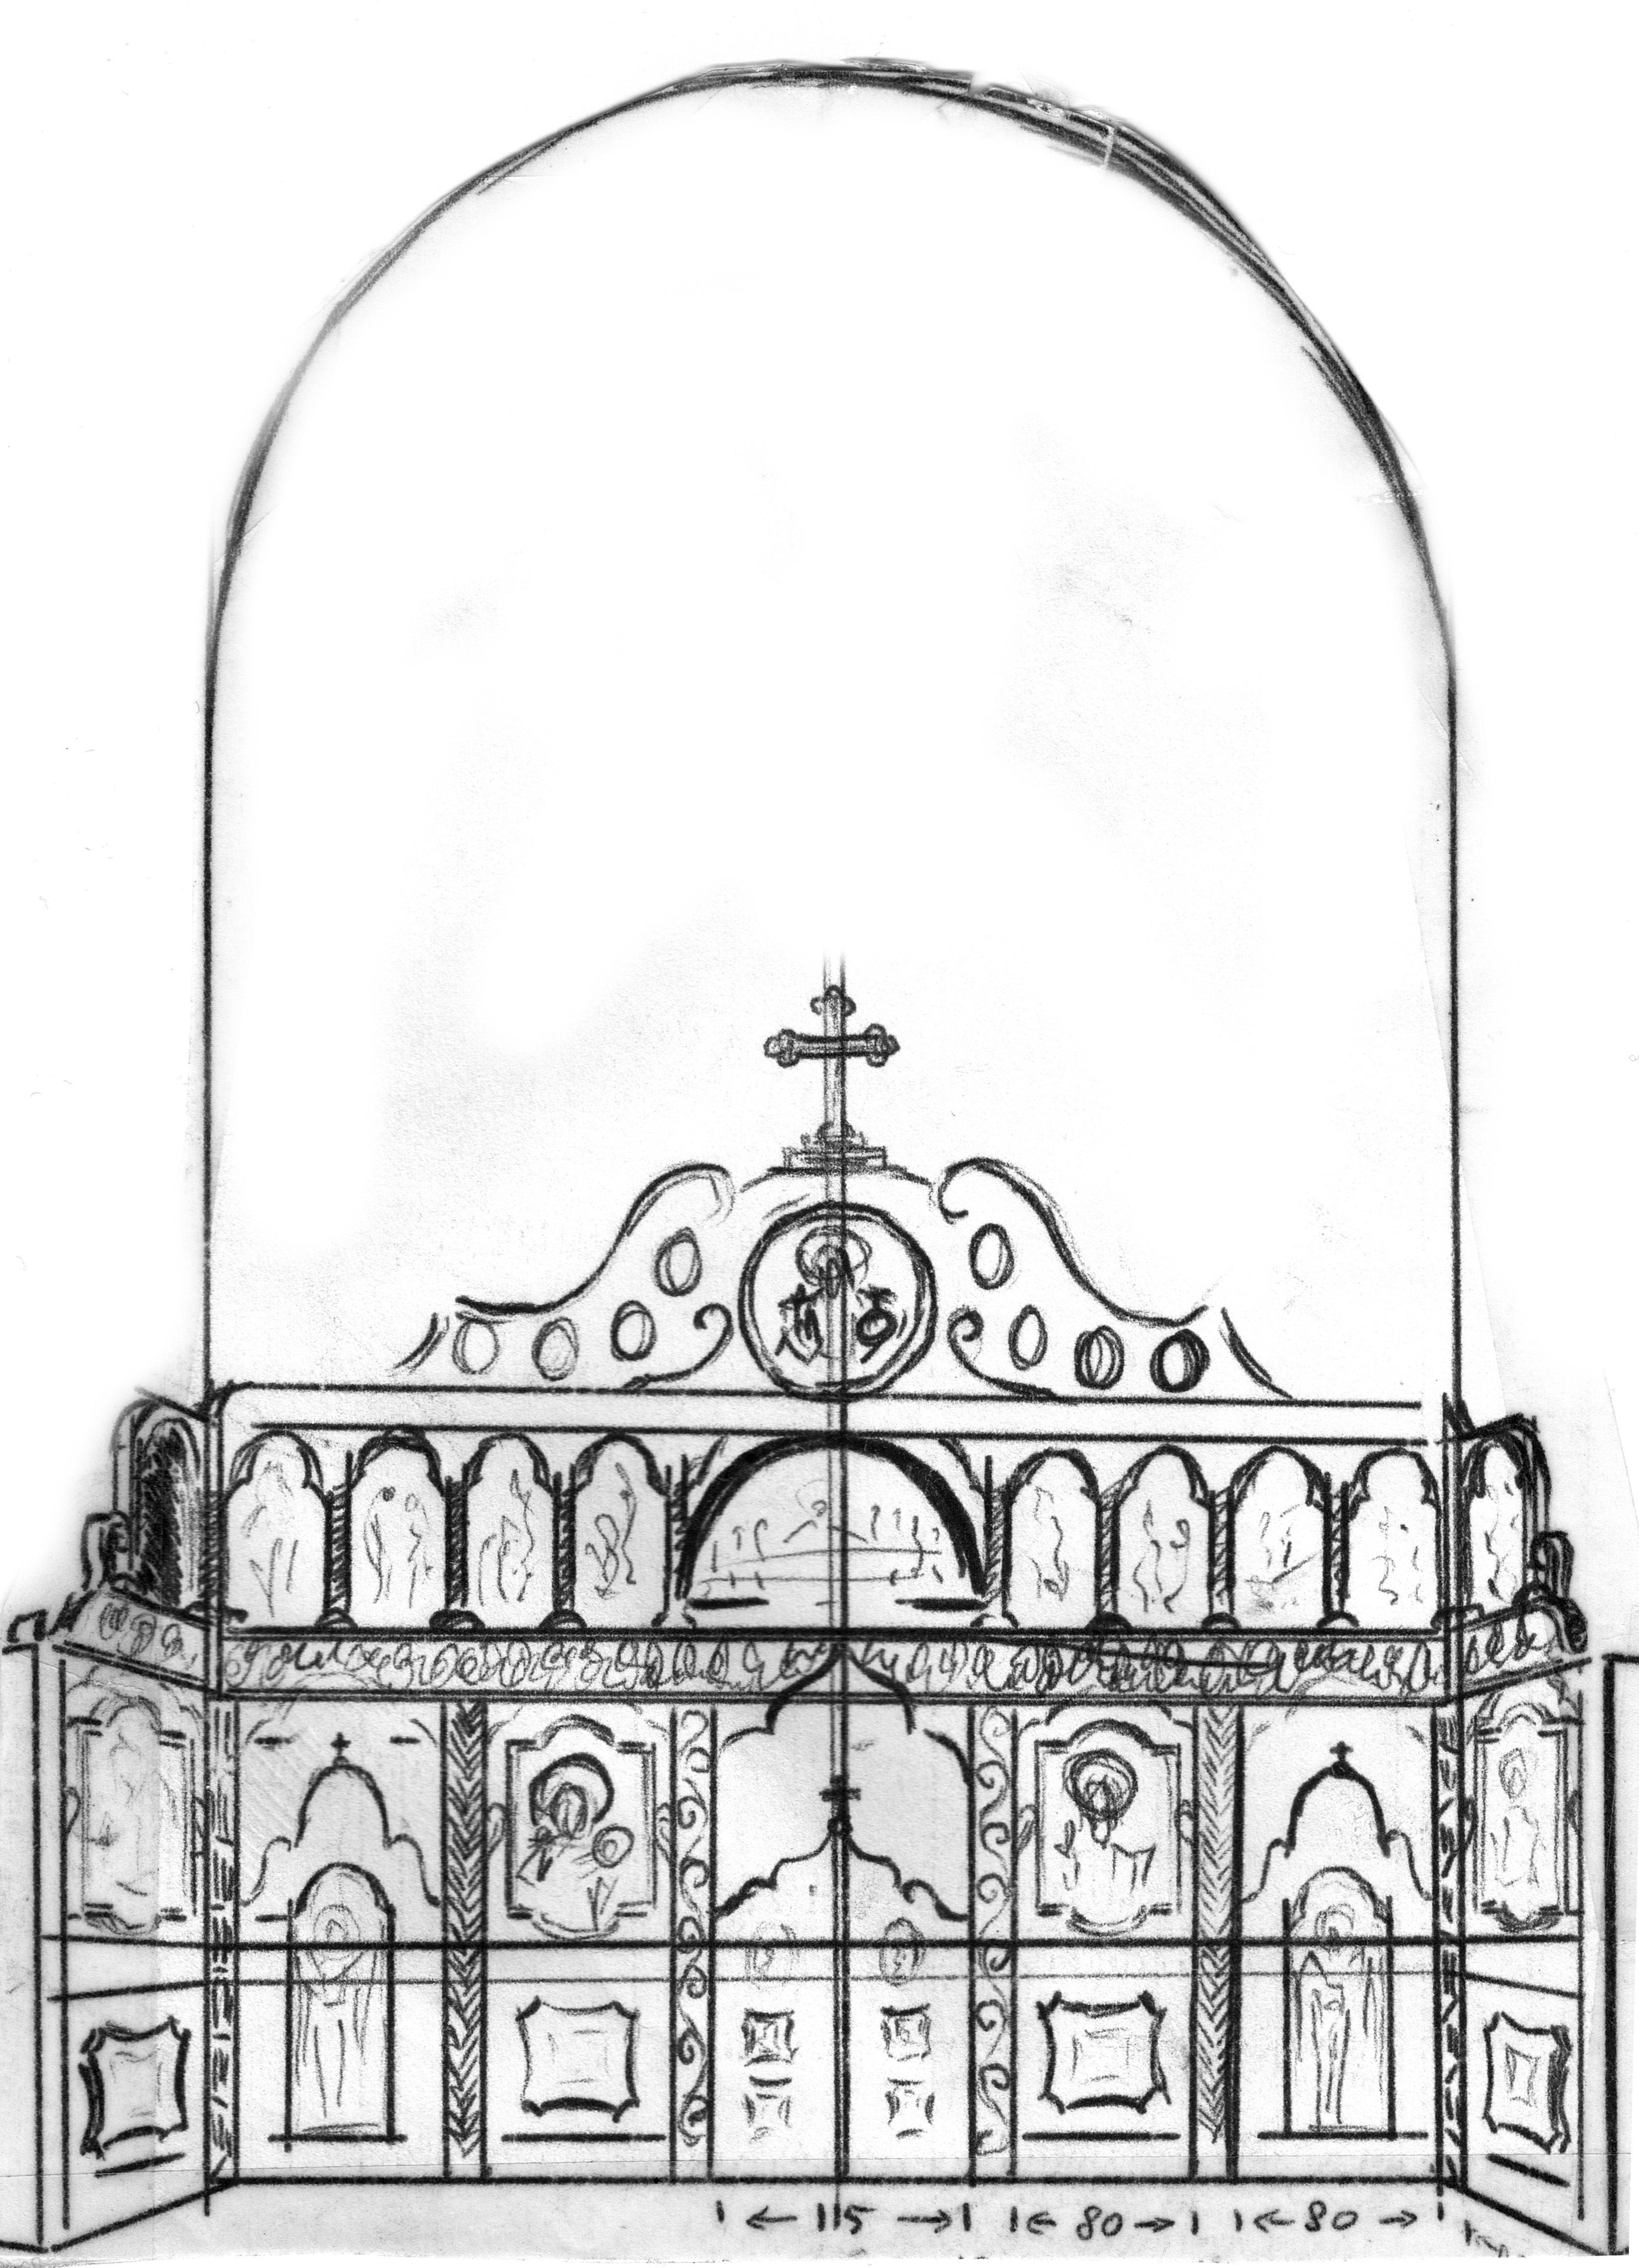 door pencil drawing disturbing iconostasis altar door pencil drawing free download iconostasis free image